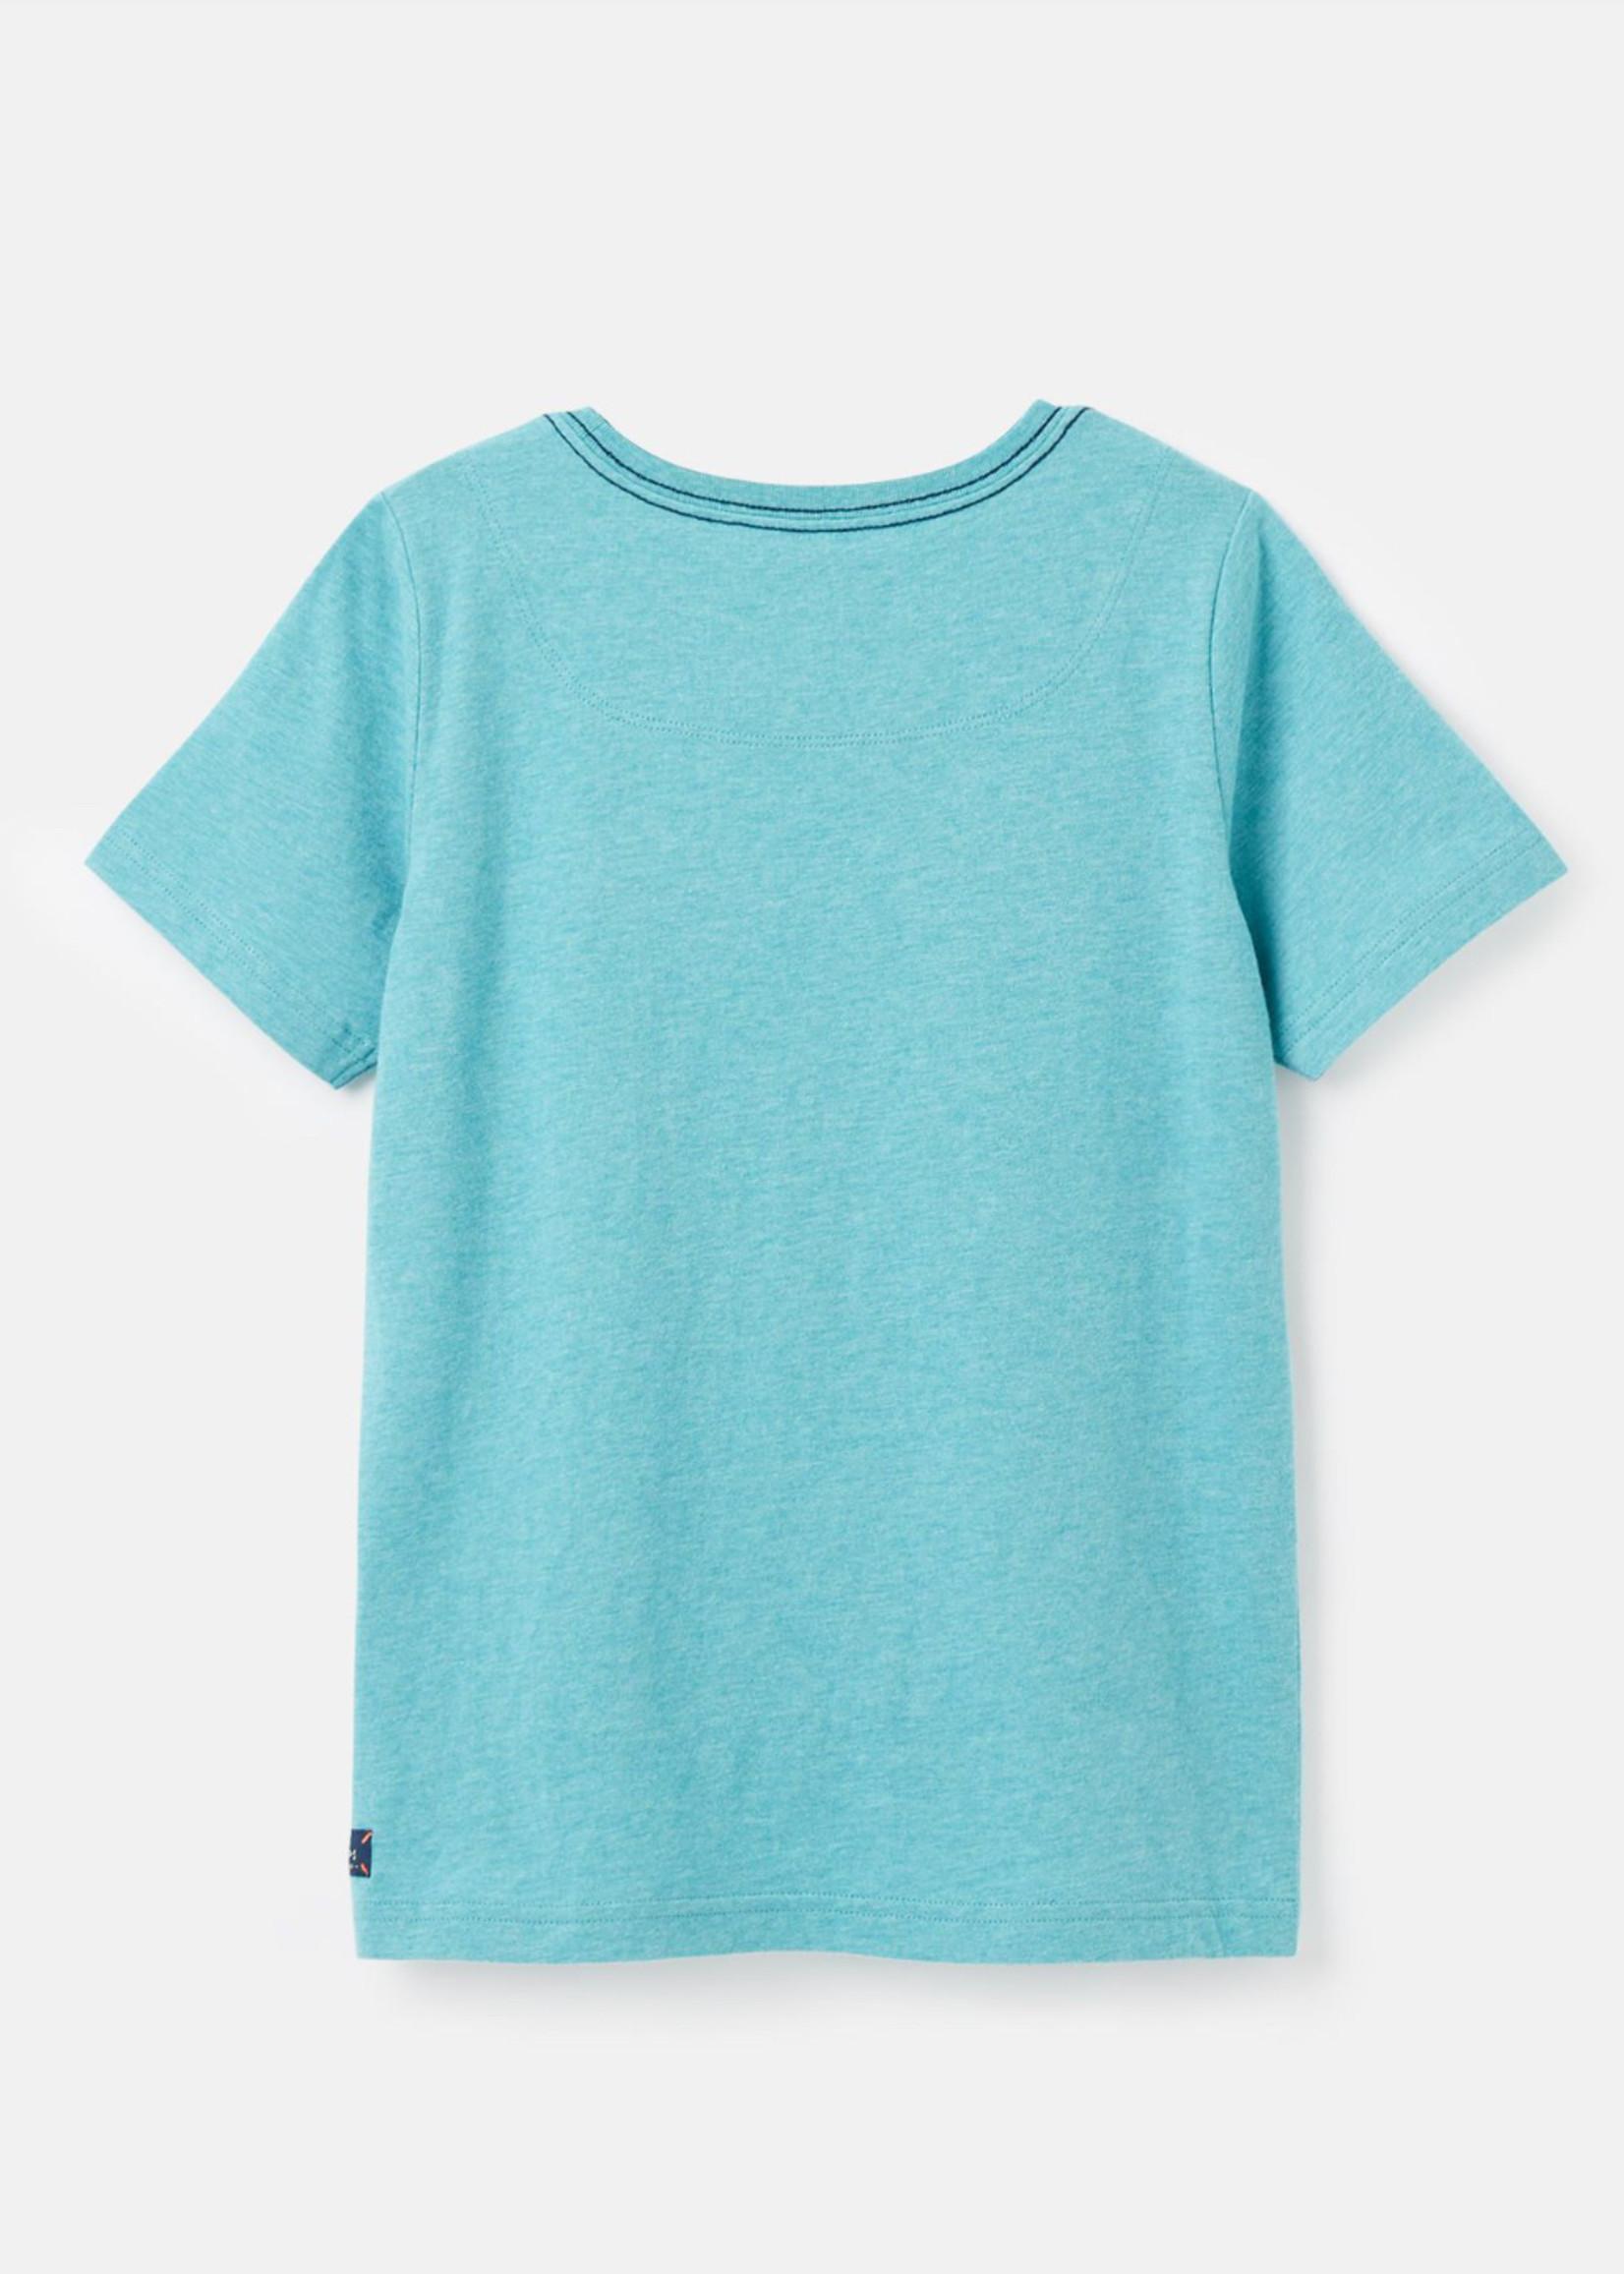 joules Blue Bear Applique Tshirt